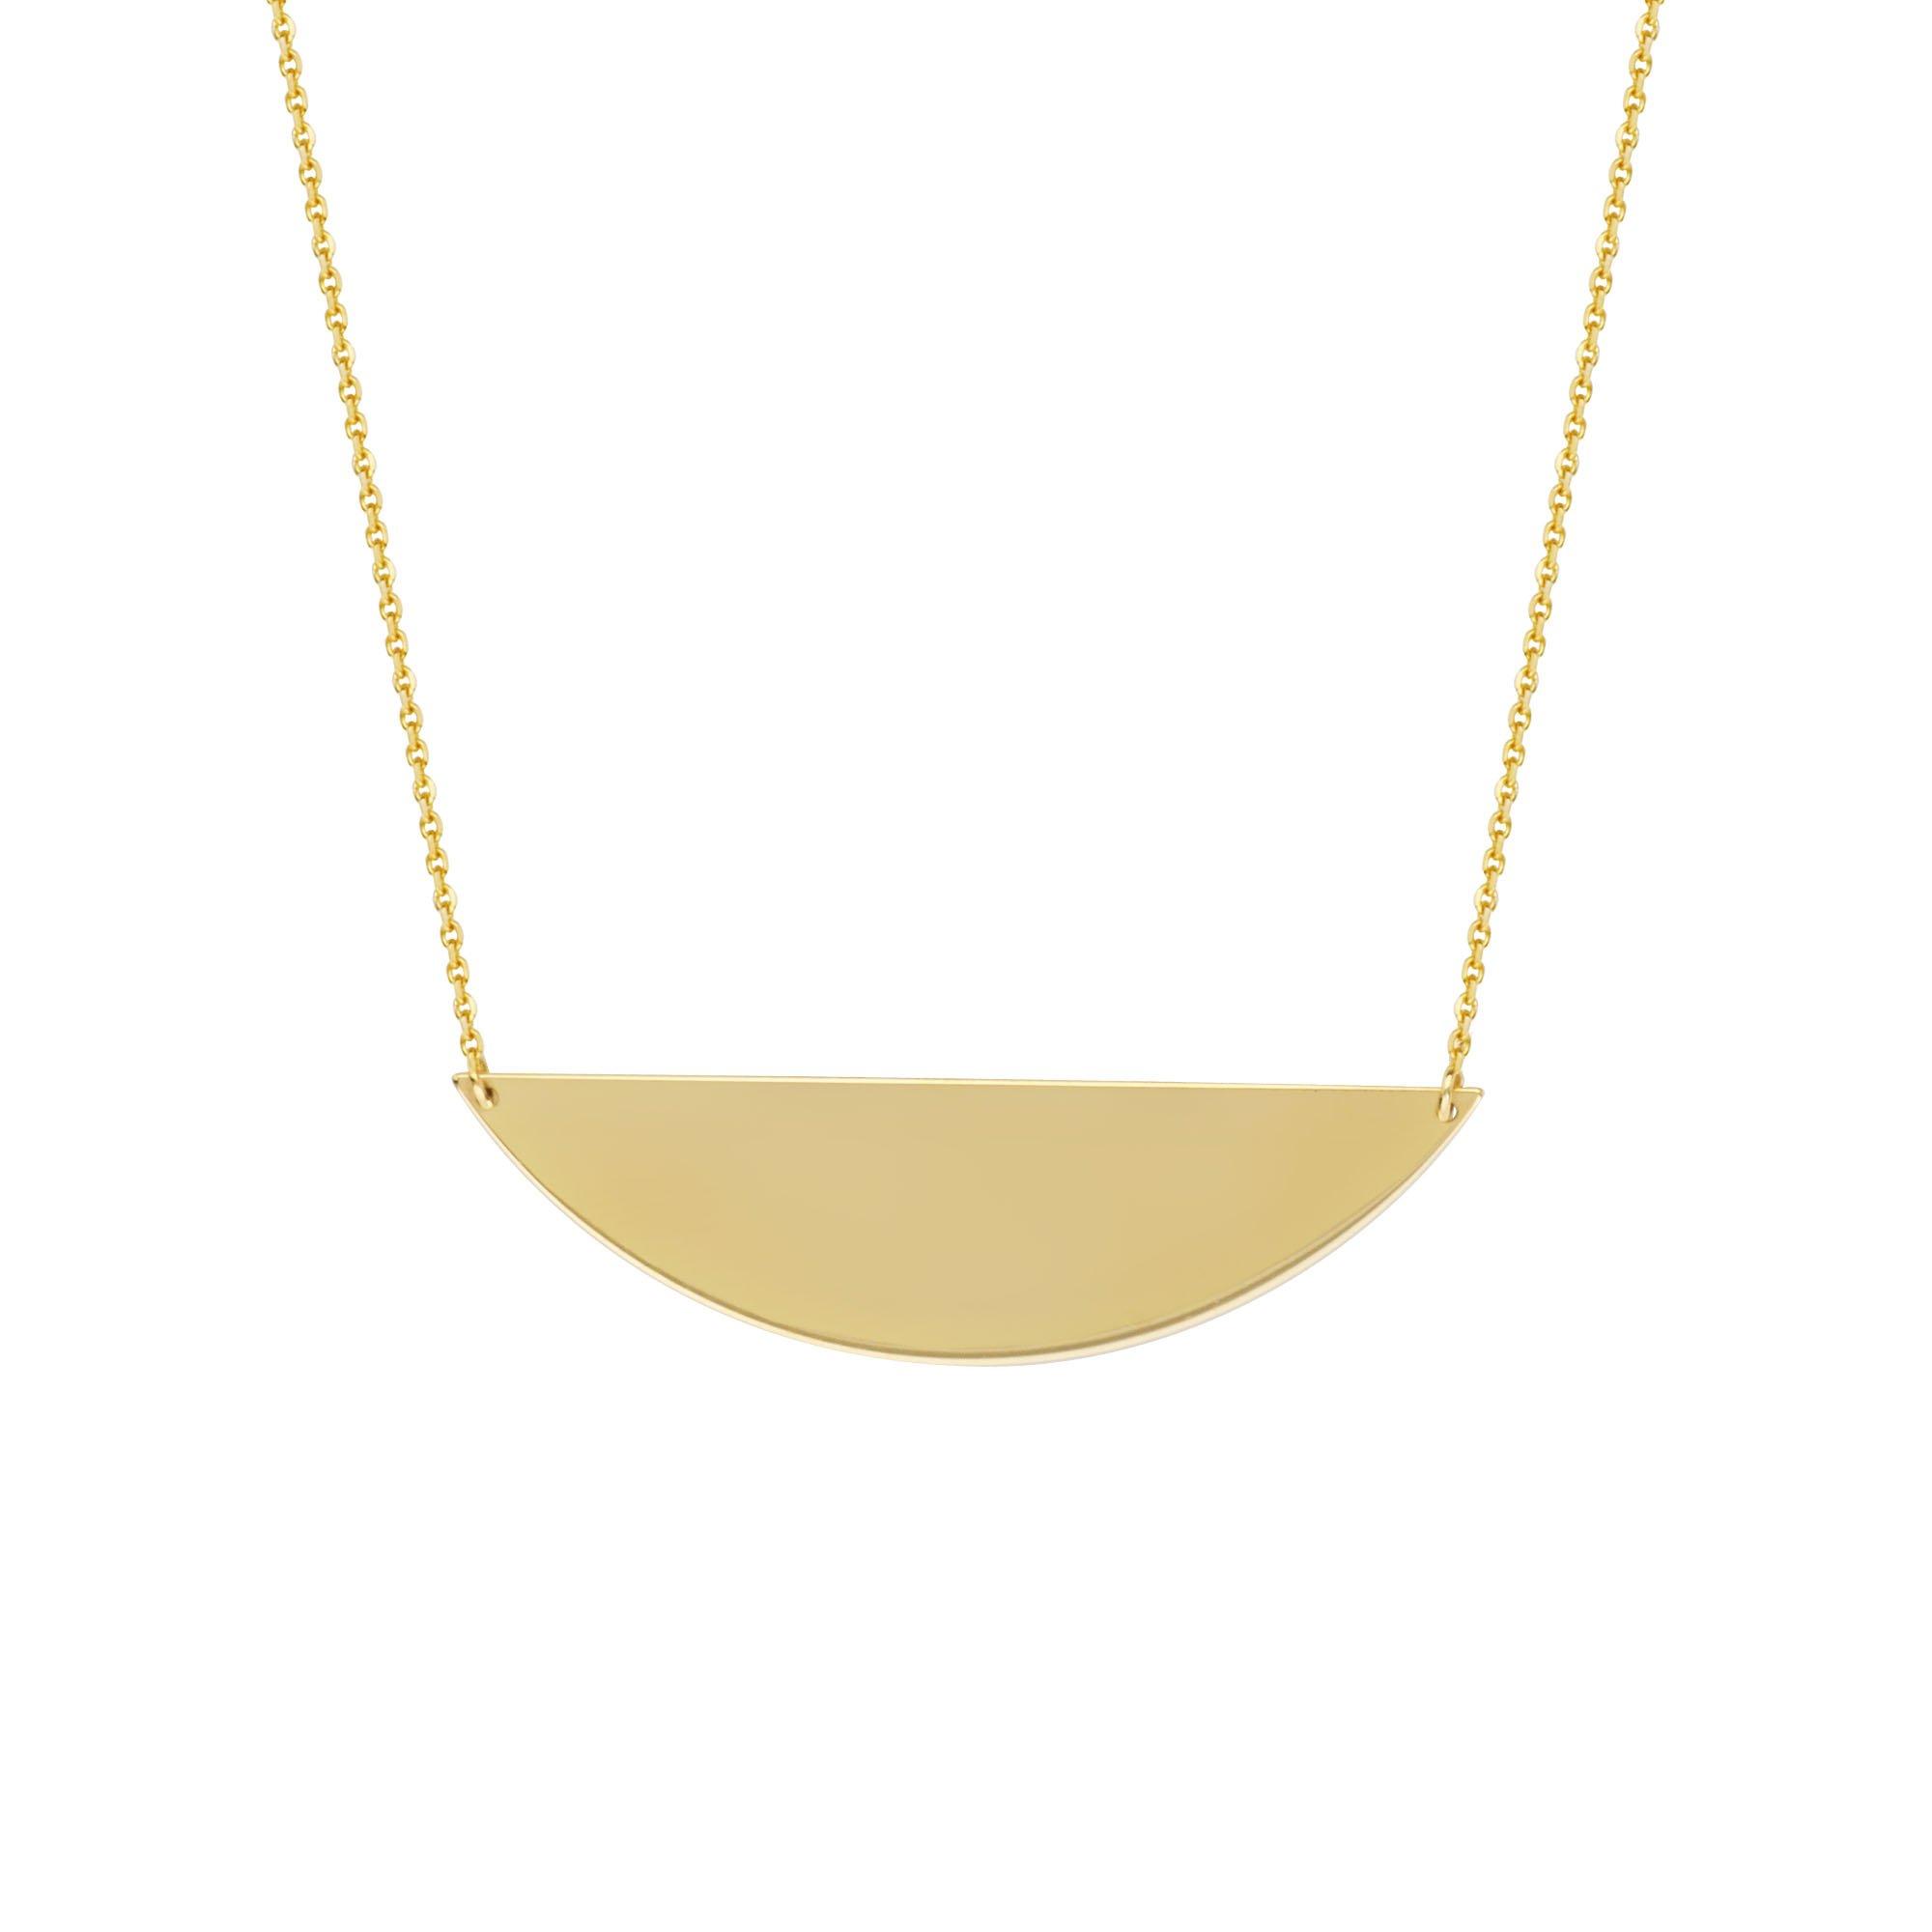 14k Yellow Gold Half Circle Necklace Adjustable Length